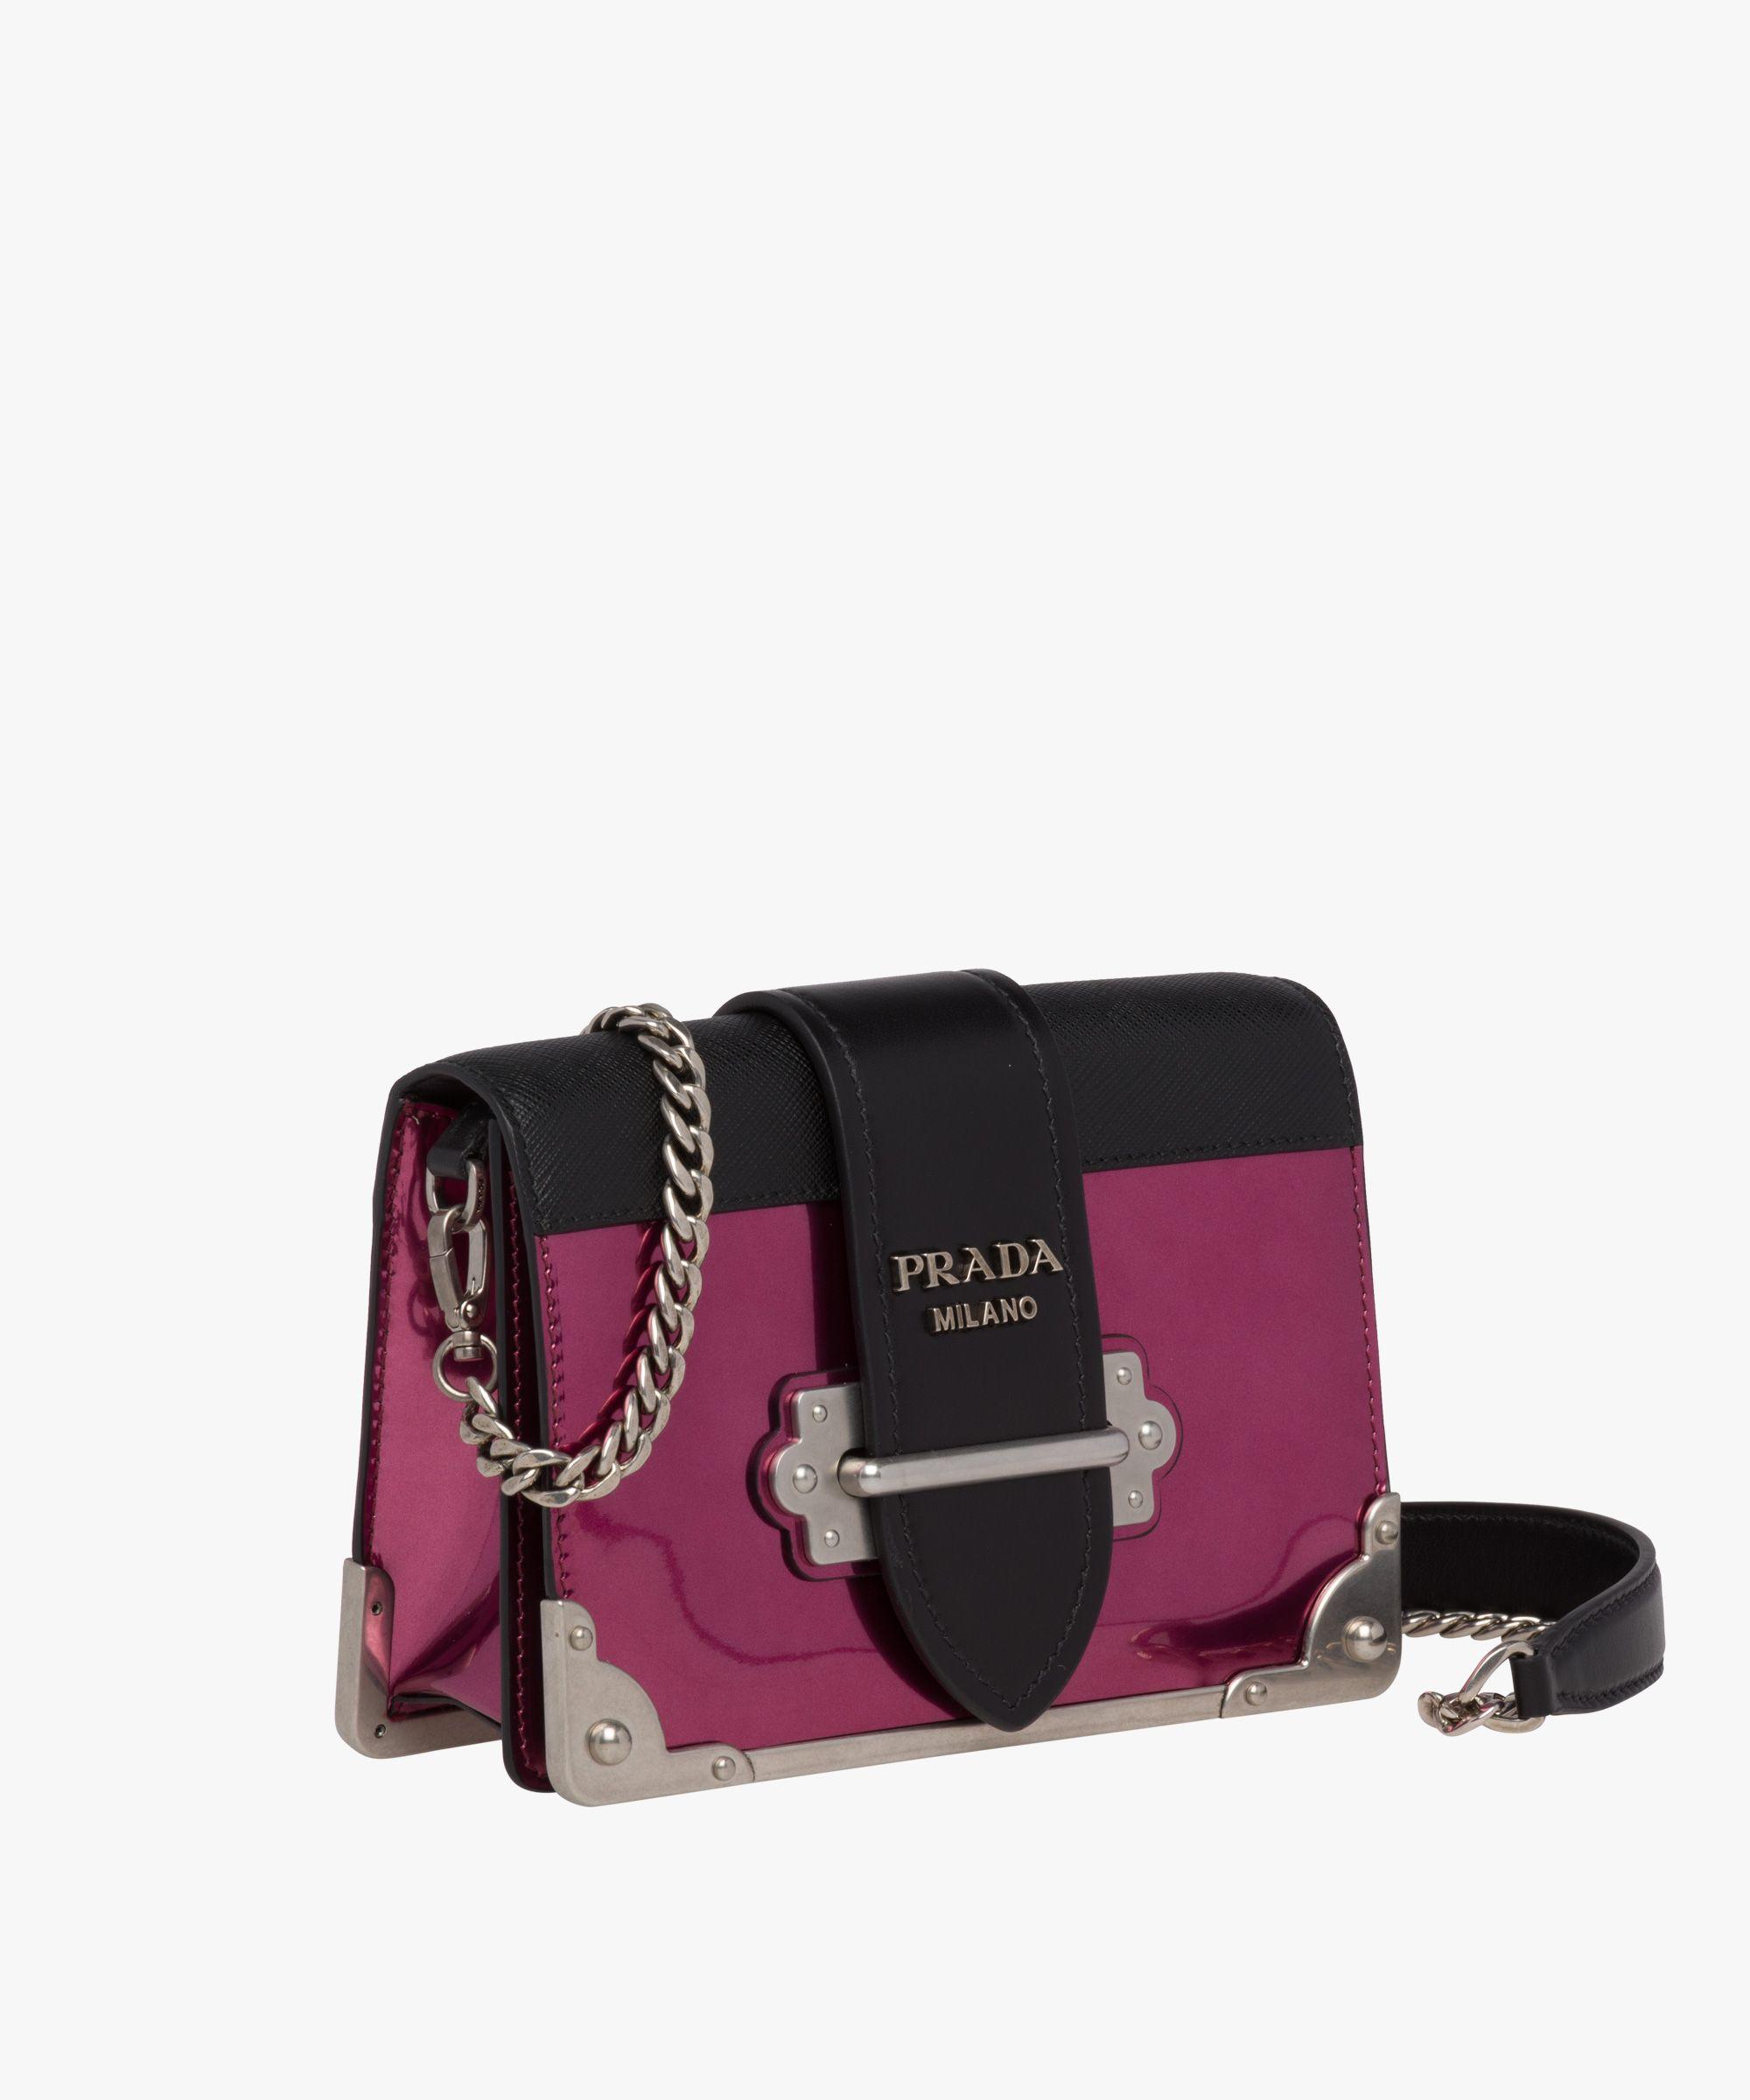 Prada - Cahier hibiscus black metallic leather shoulder bag  8c48a5d084eb6